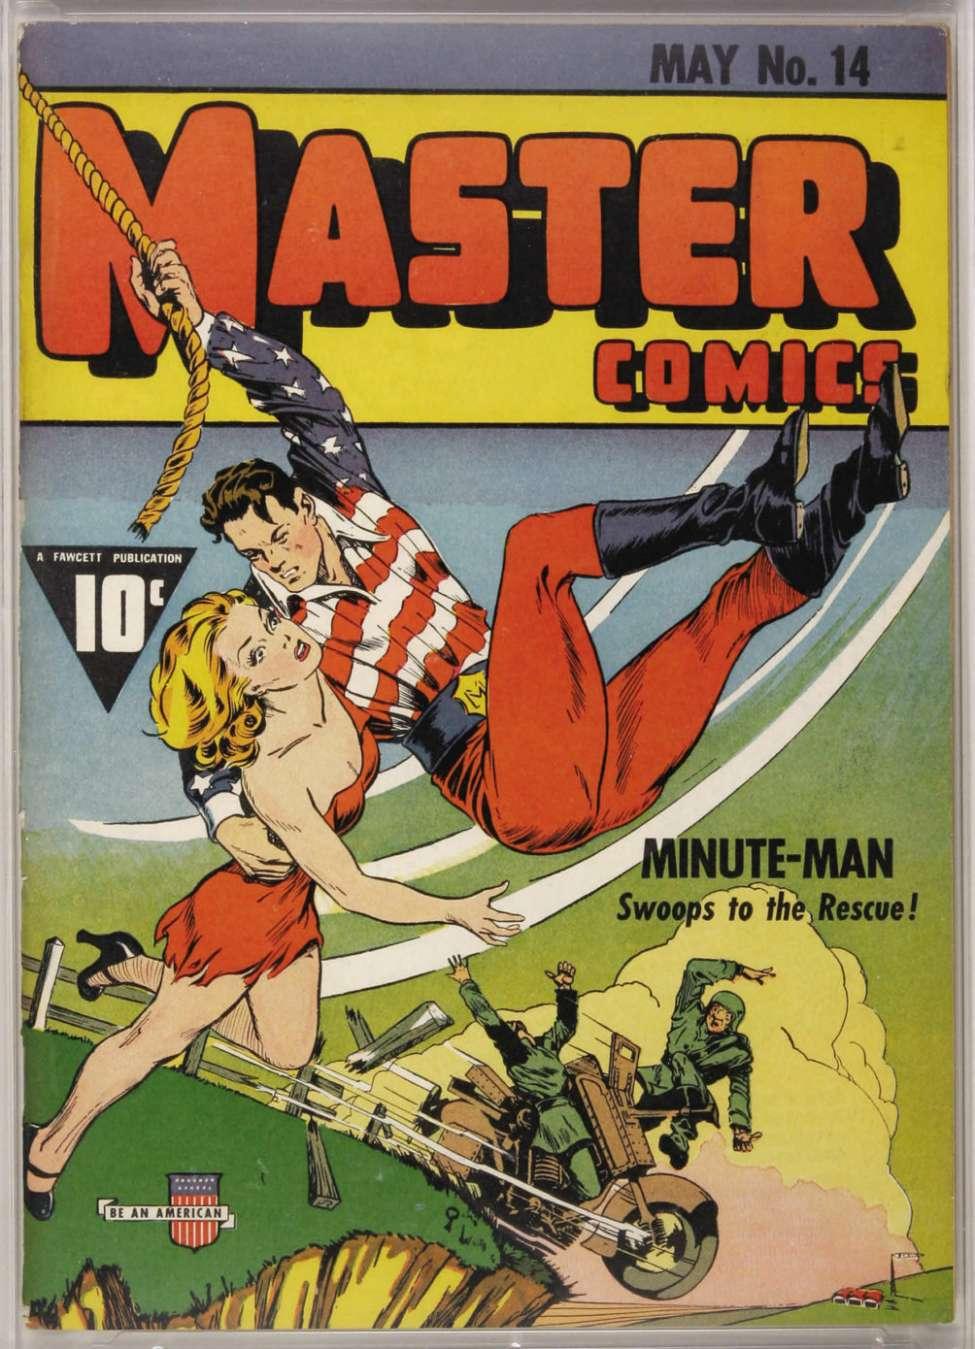 Master Comics #14 by Fawcett